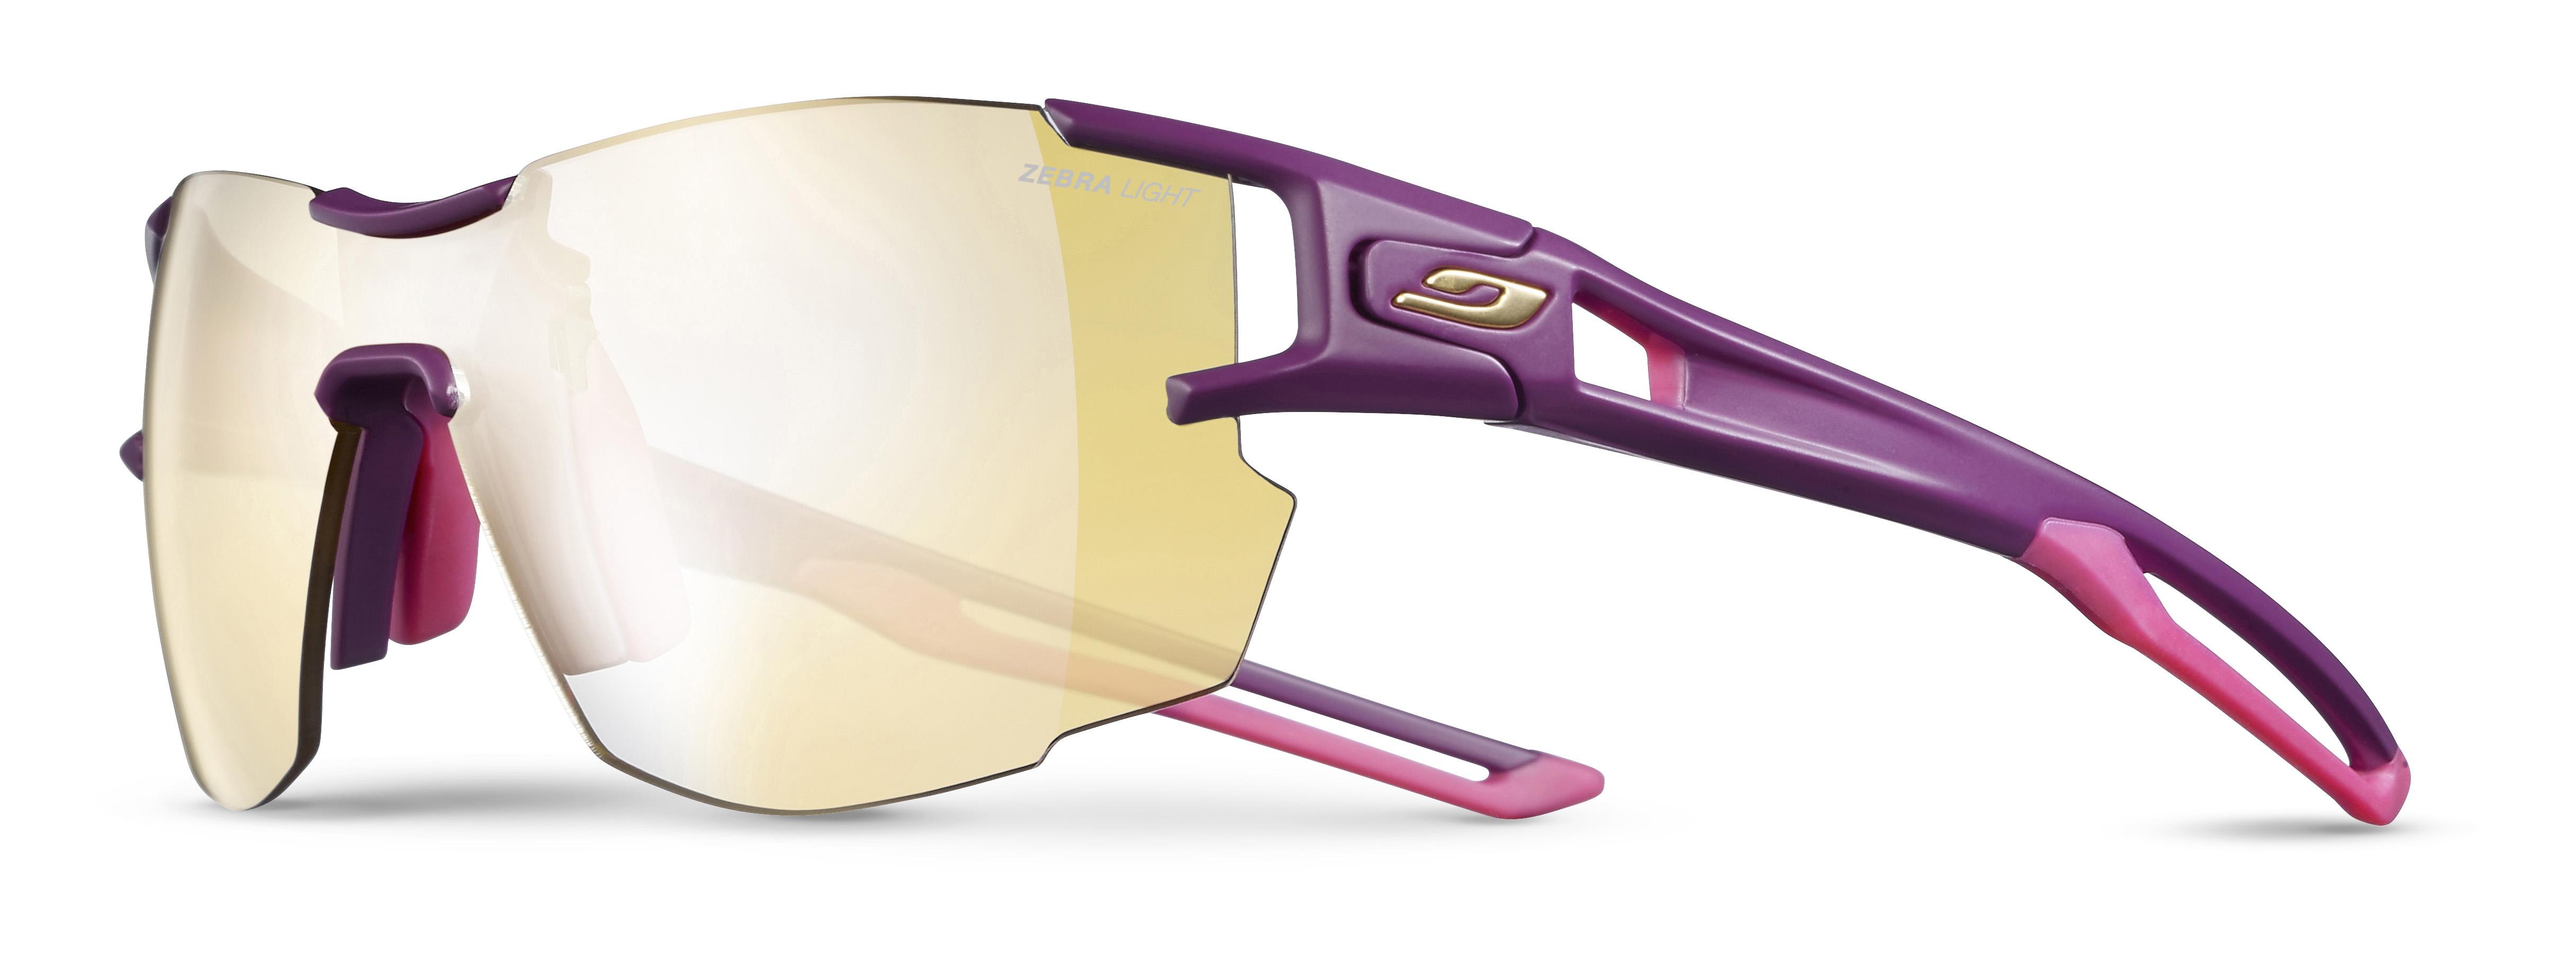 Image of   Julbo Aerolite Zebra Light Sunglasses - Purple/Rubine Red